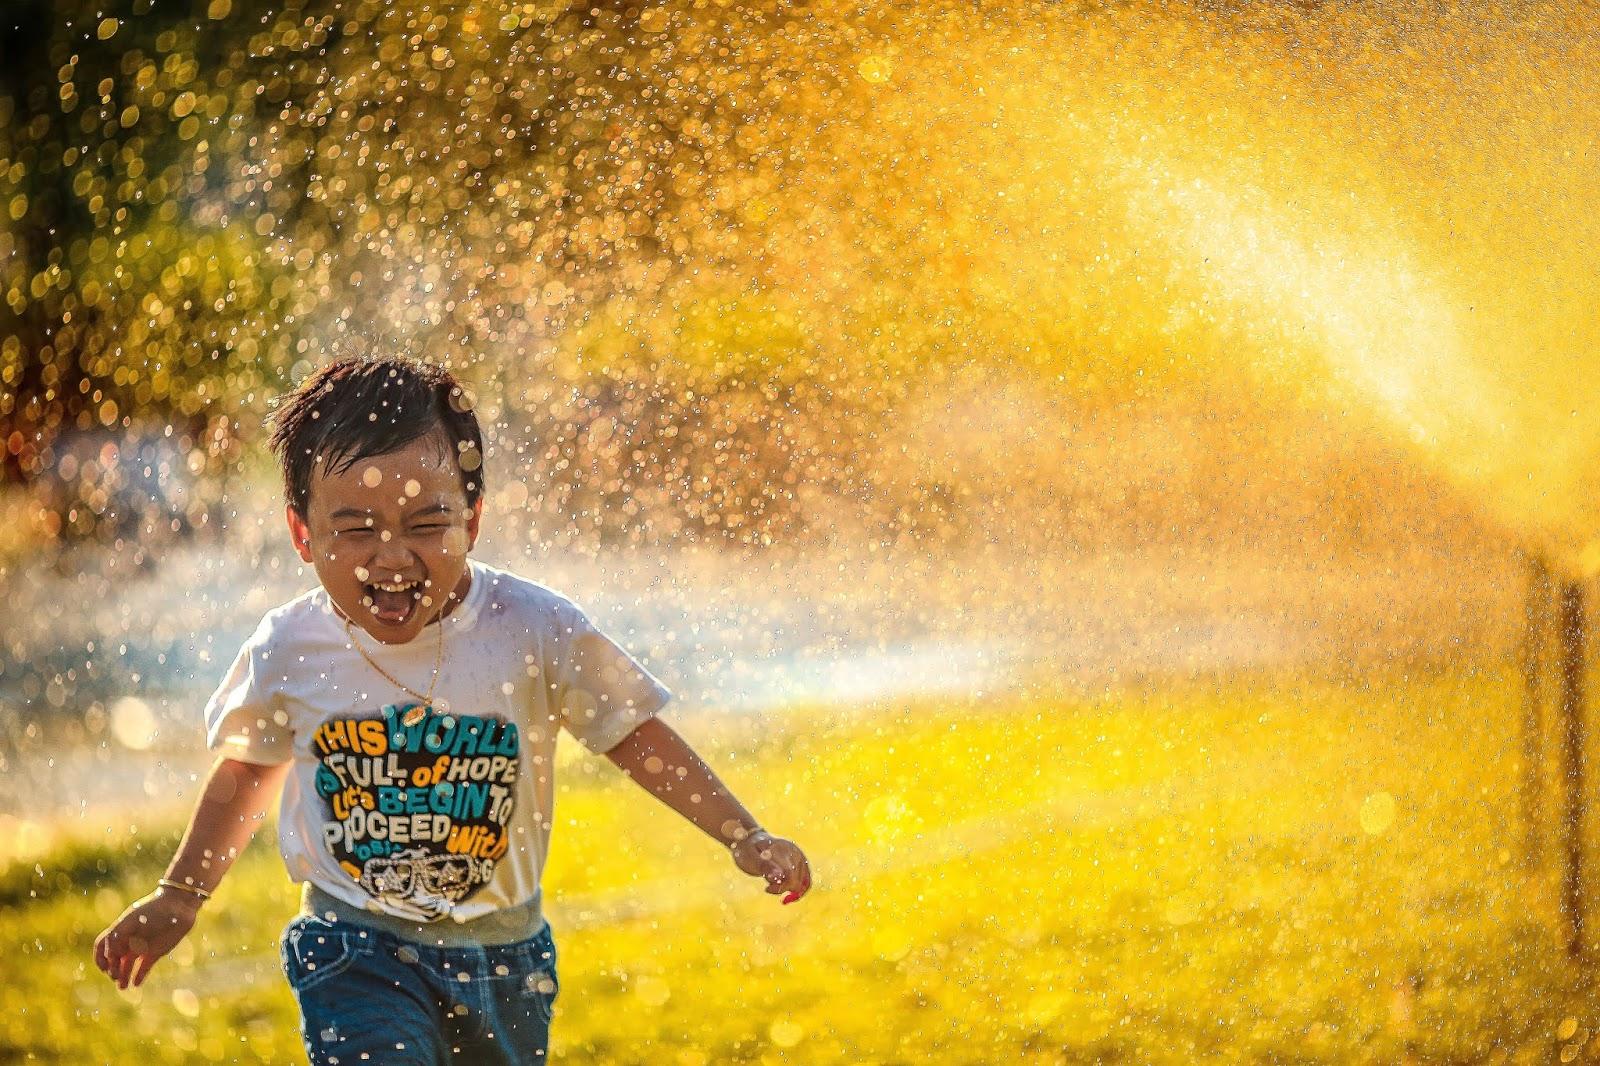 boy running through water sprinkler